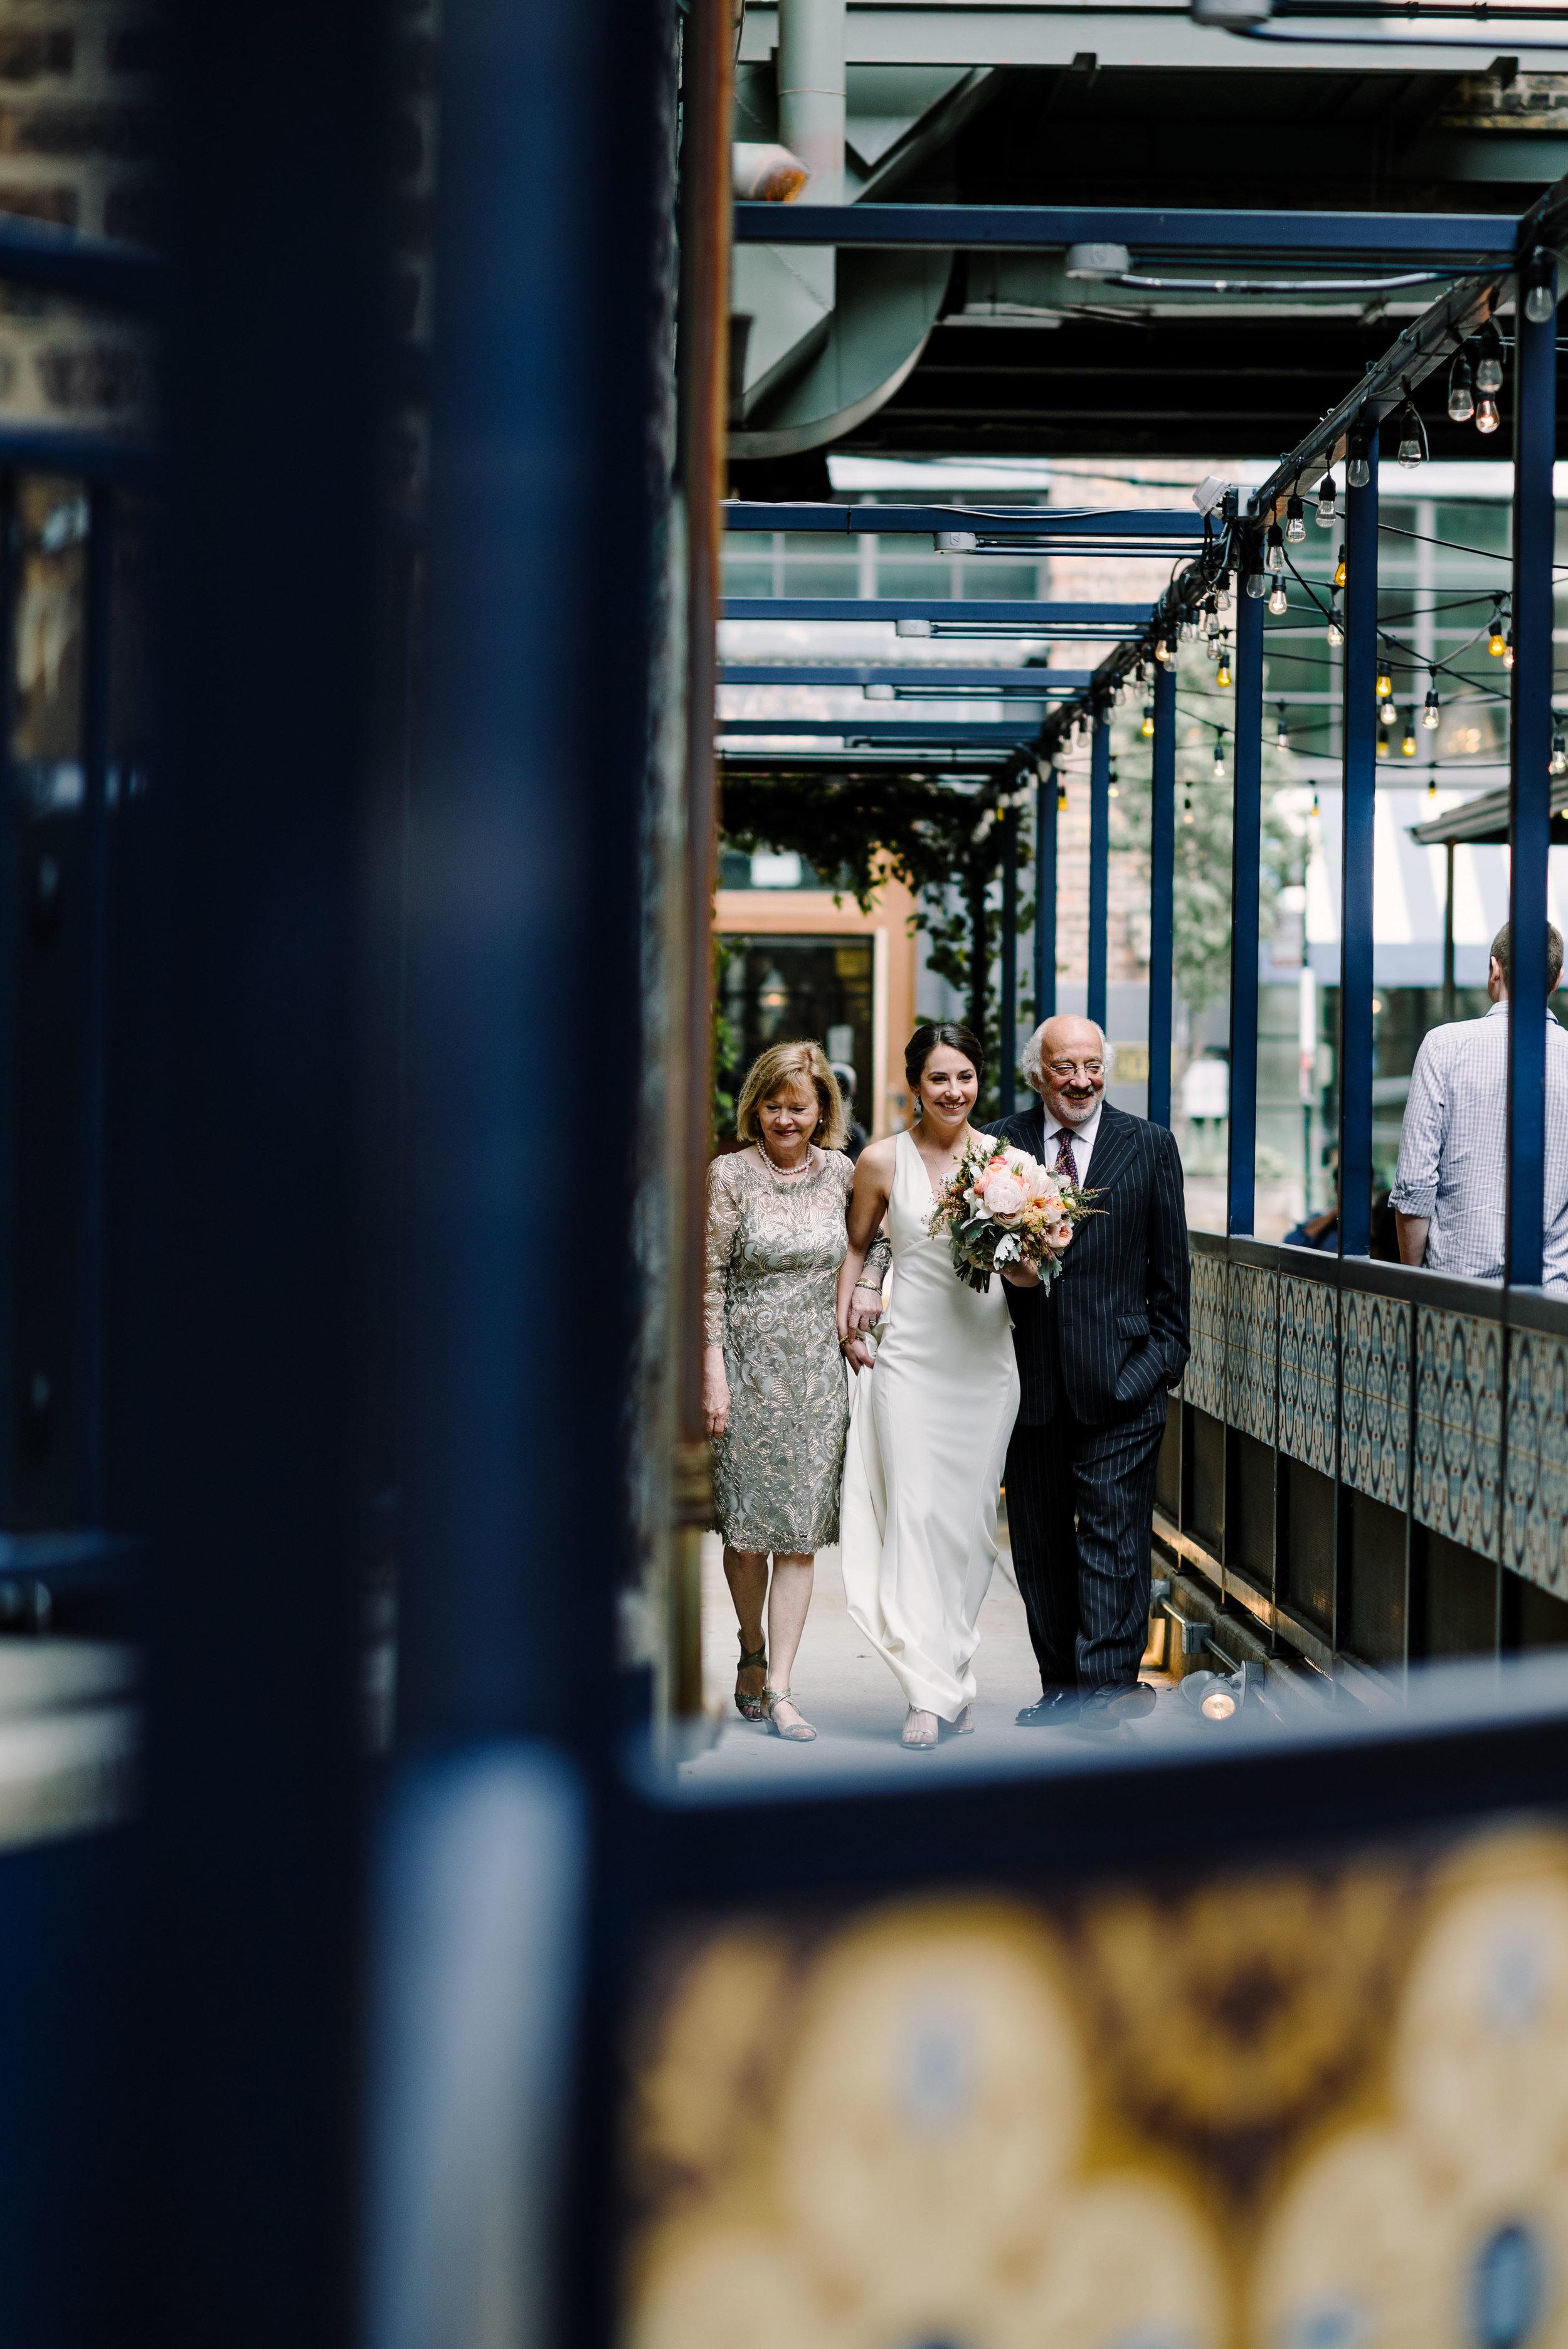 Patricia-Steve-Blog-Indianapolis-Wedding-58.jpg